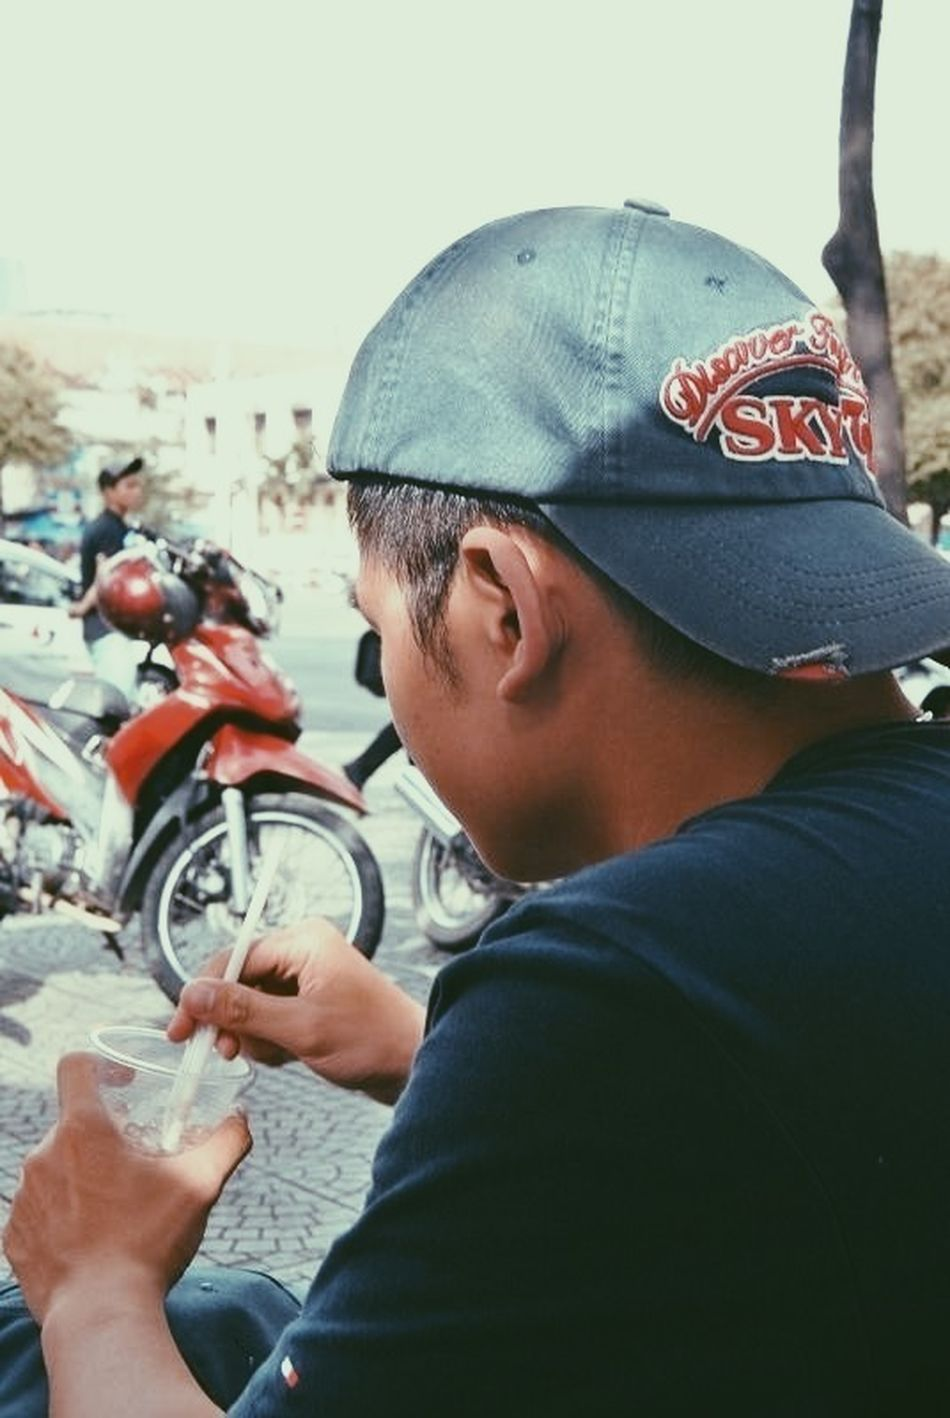 Vscocam EyeEm Best Shots Saigon Coffee Thằng vé số (Chụp bởi: Lùn) #vscocam #saigon #coffee #caphebet